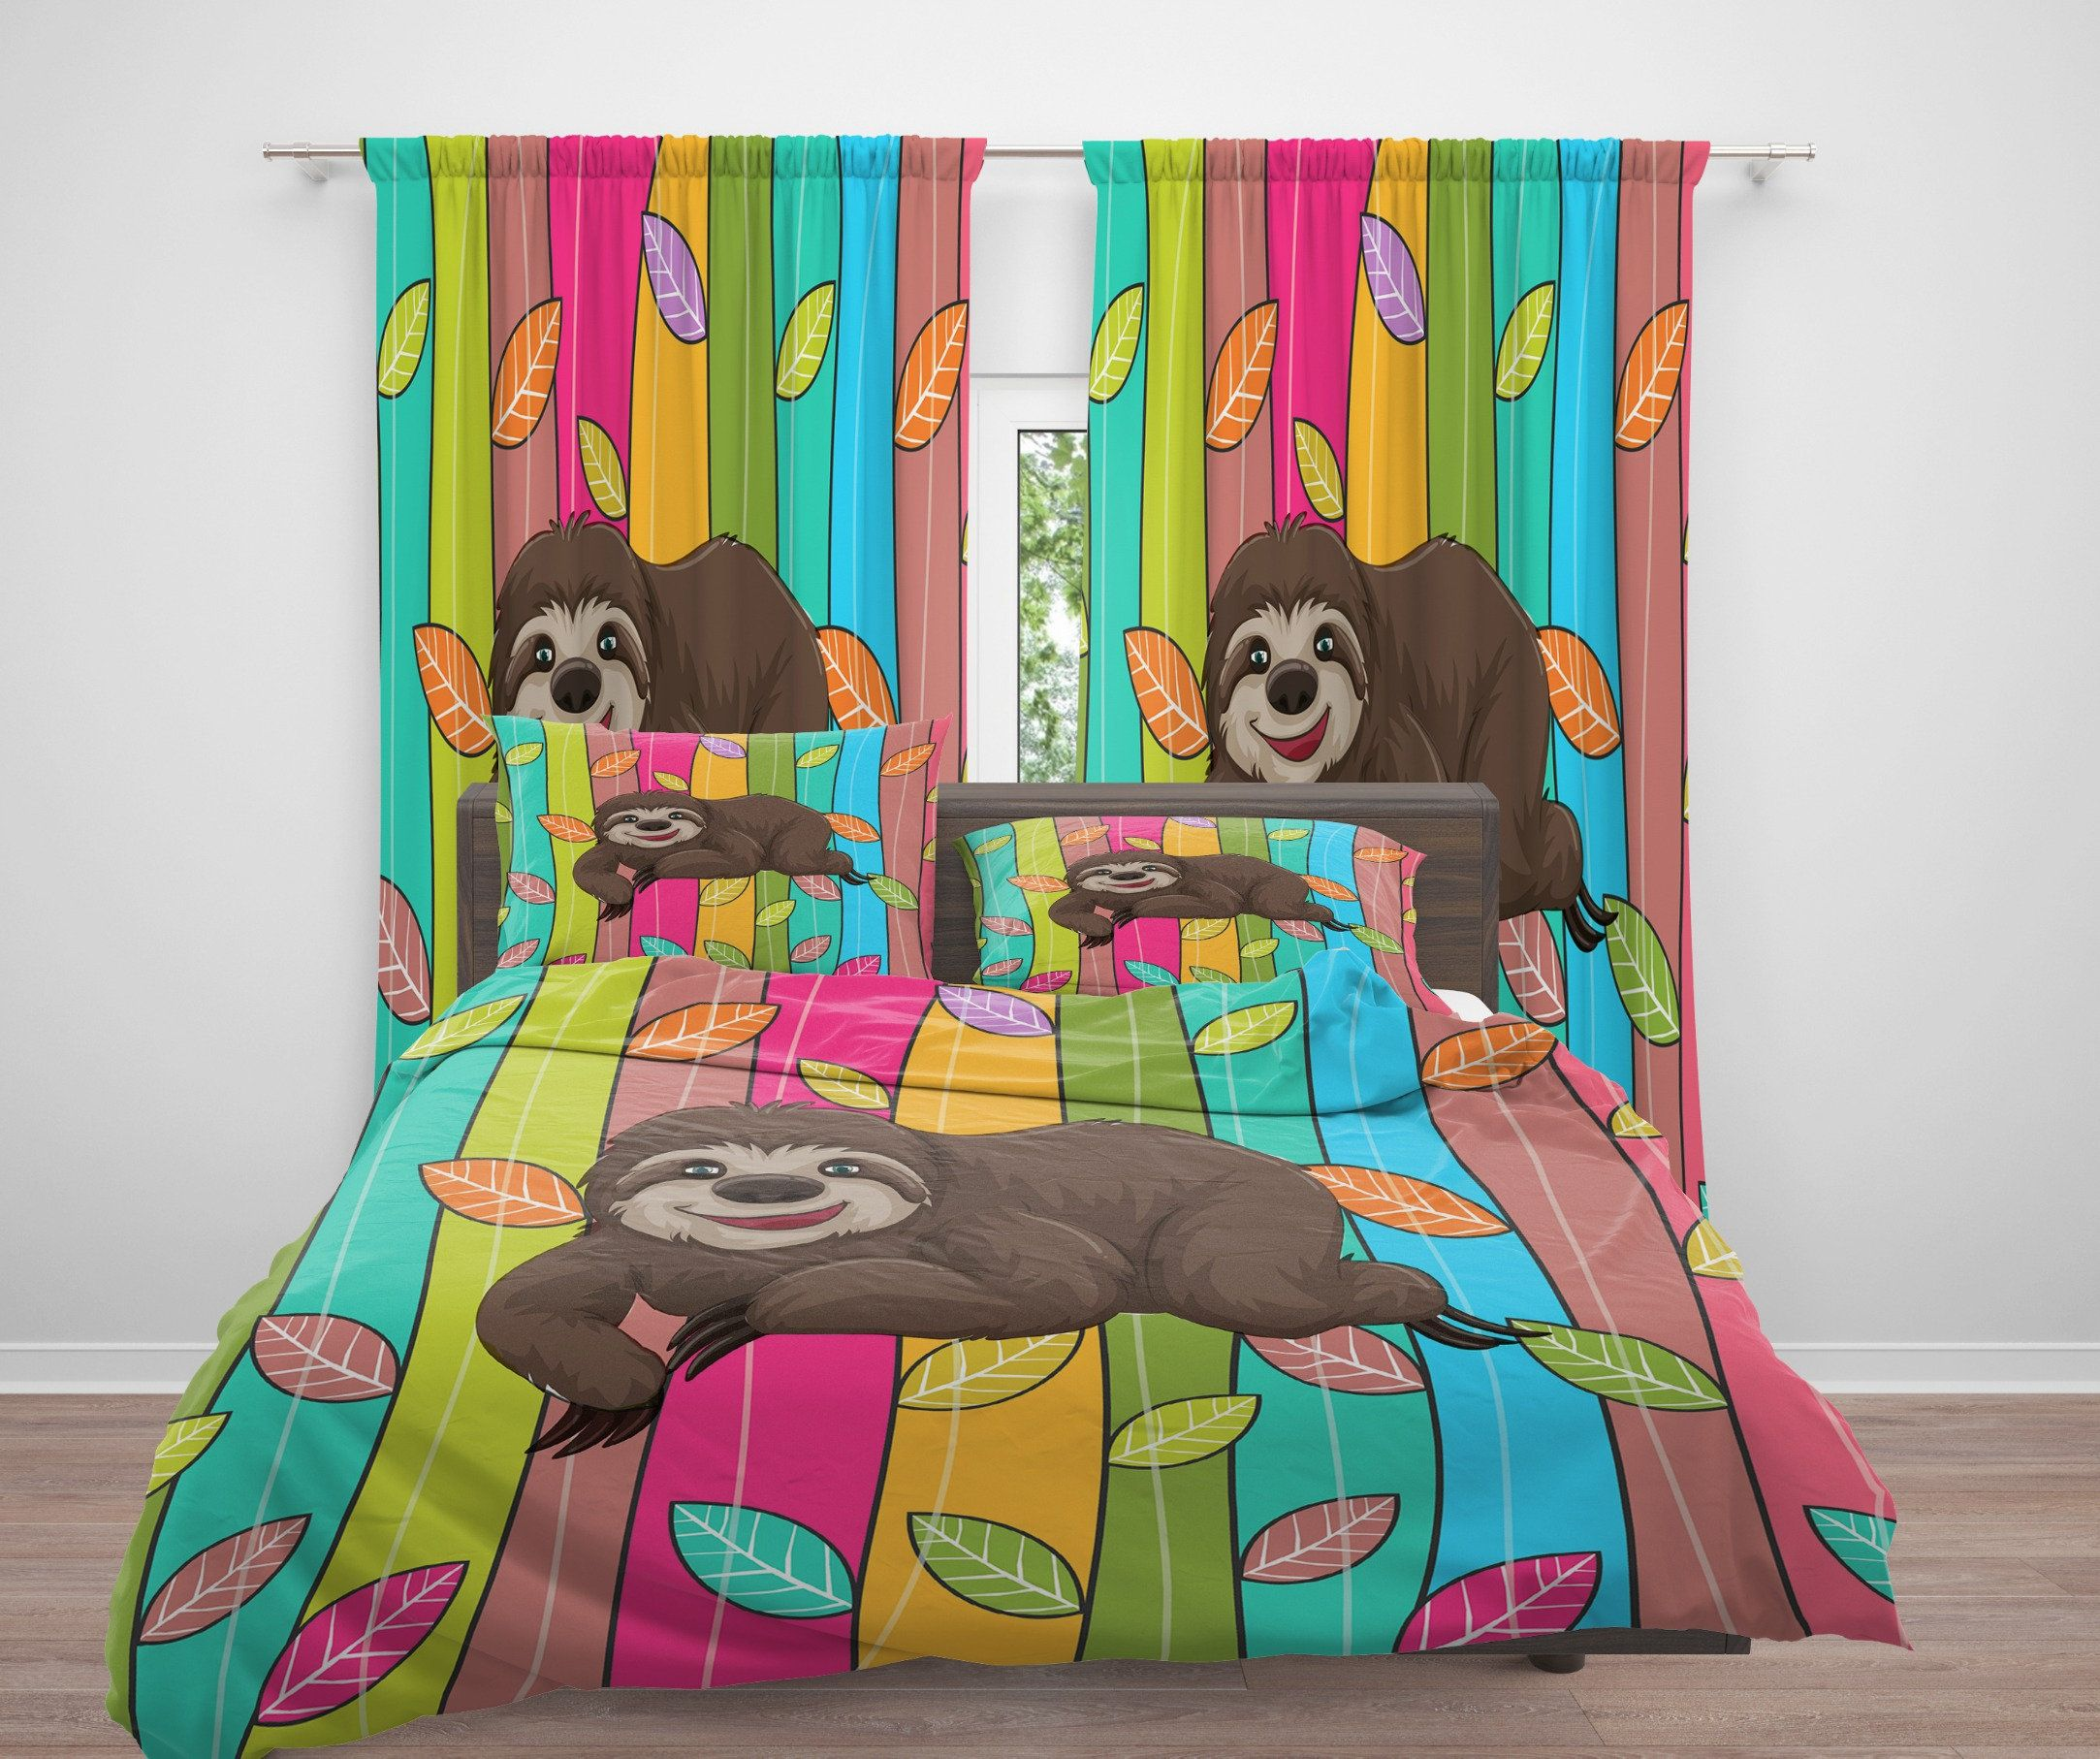 Sloth Bedding Duvet Cover Or Comforter Twin Full Queen King